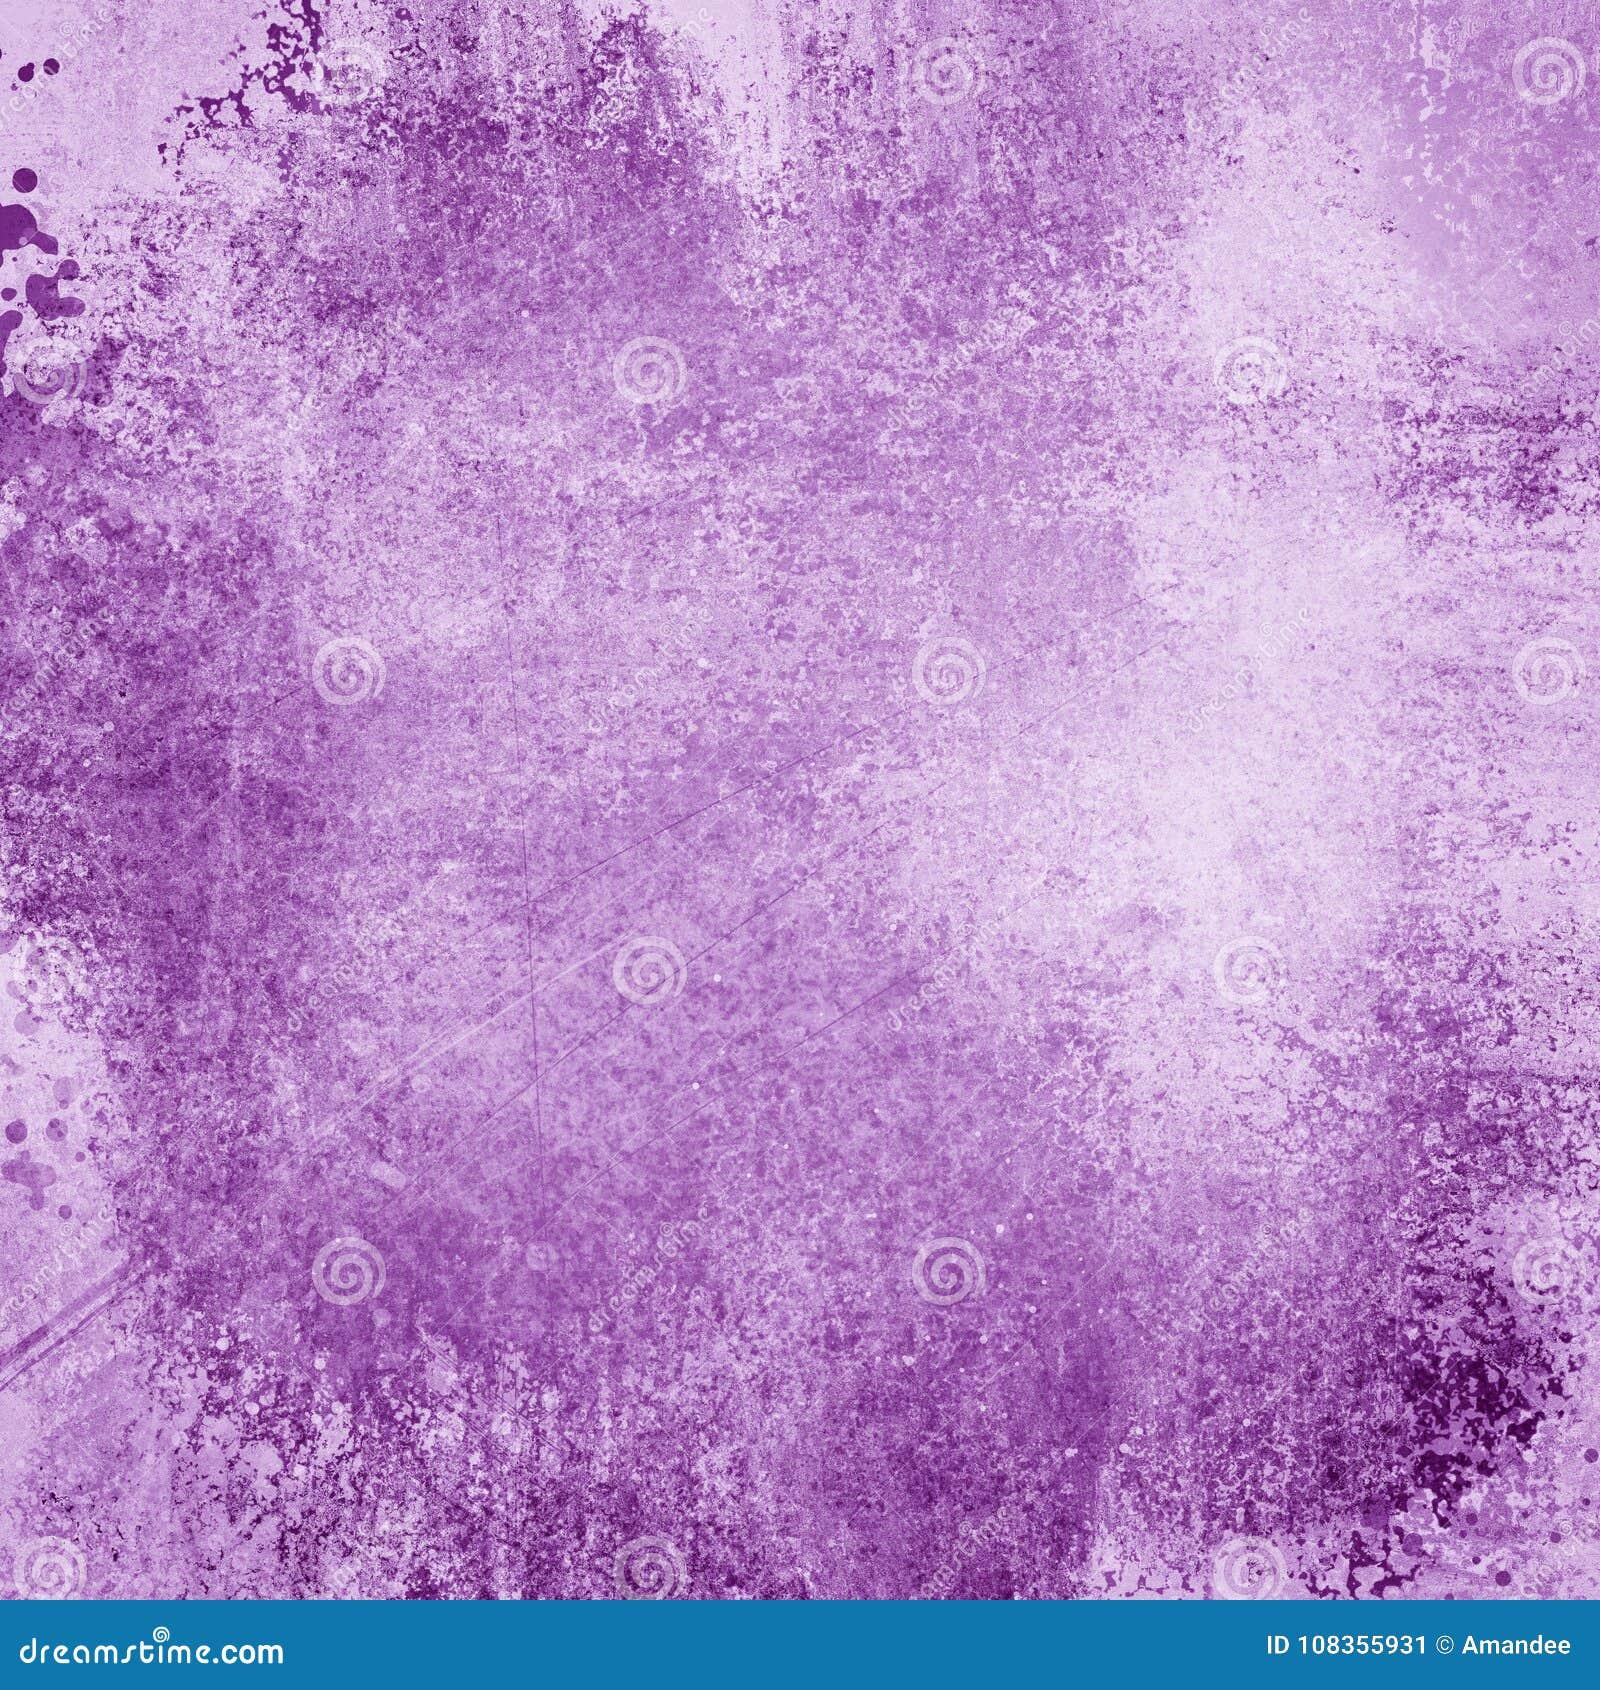 Donkere purpere en witte achtergrond met uitstekende textuur en partijen van geroest grunge, mooie elegante en mooie achtergrond